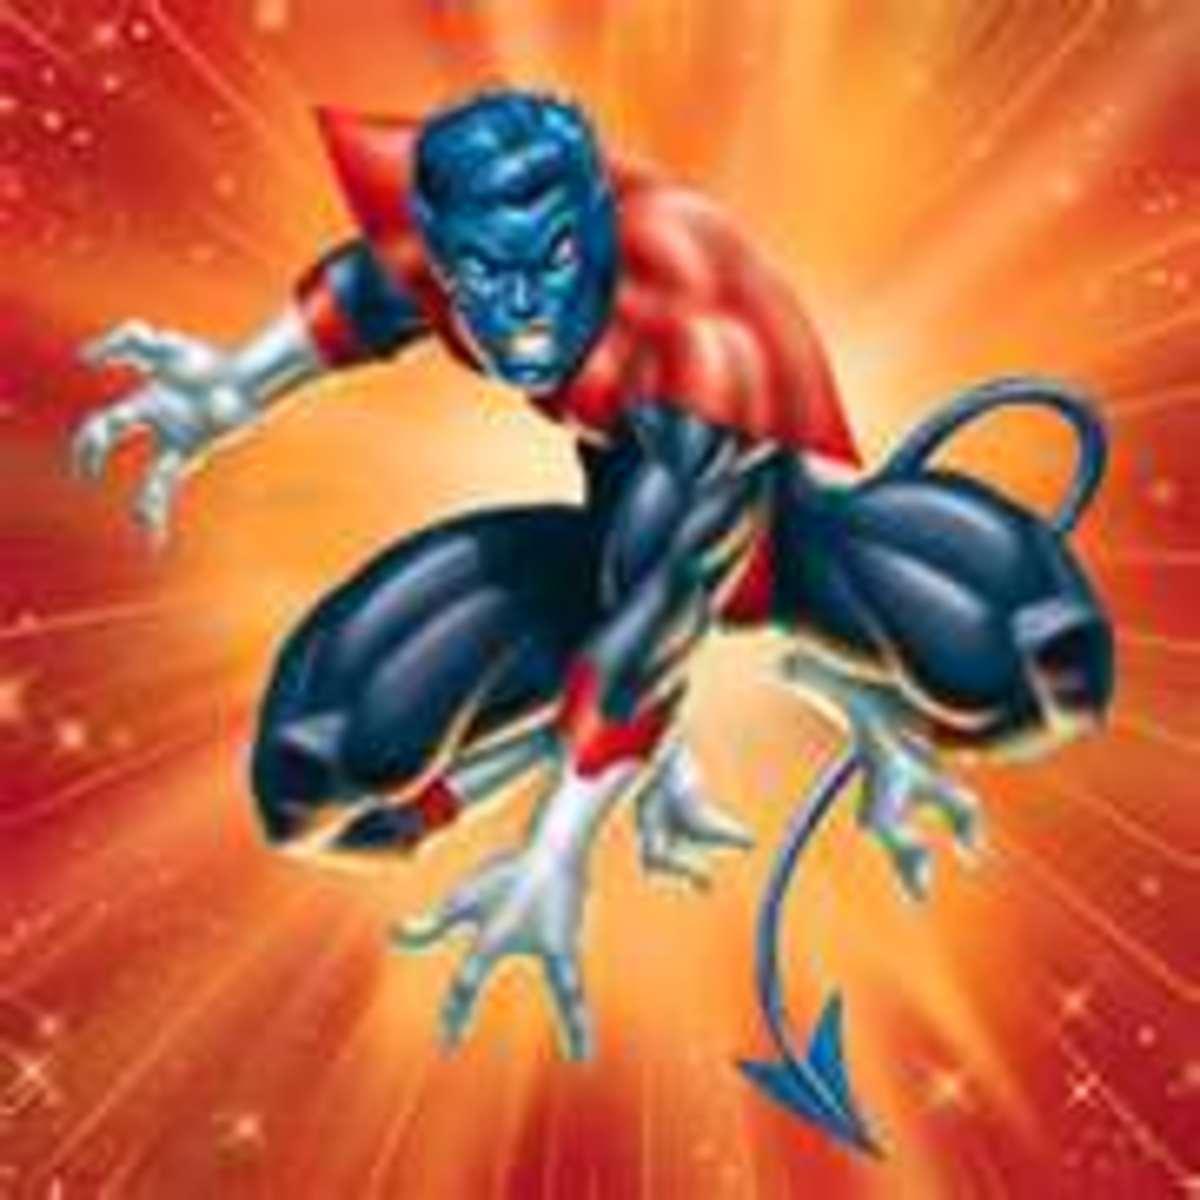 The demonic Nightcrawler is actual a soft spoken master of teleportation.